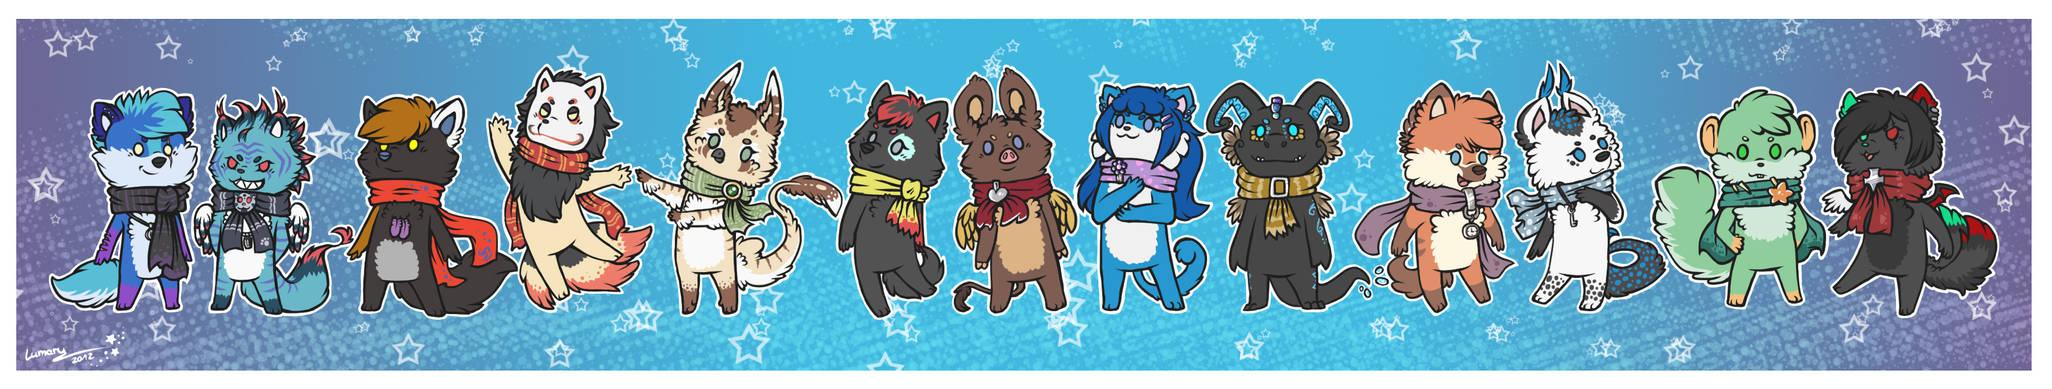 Christmas Chibis